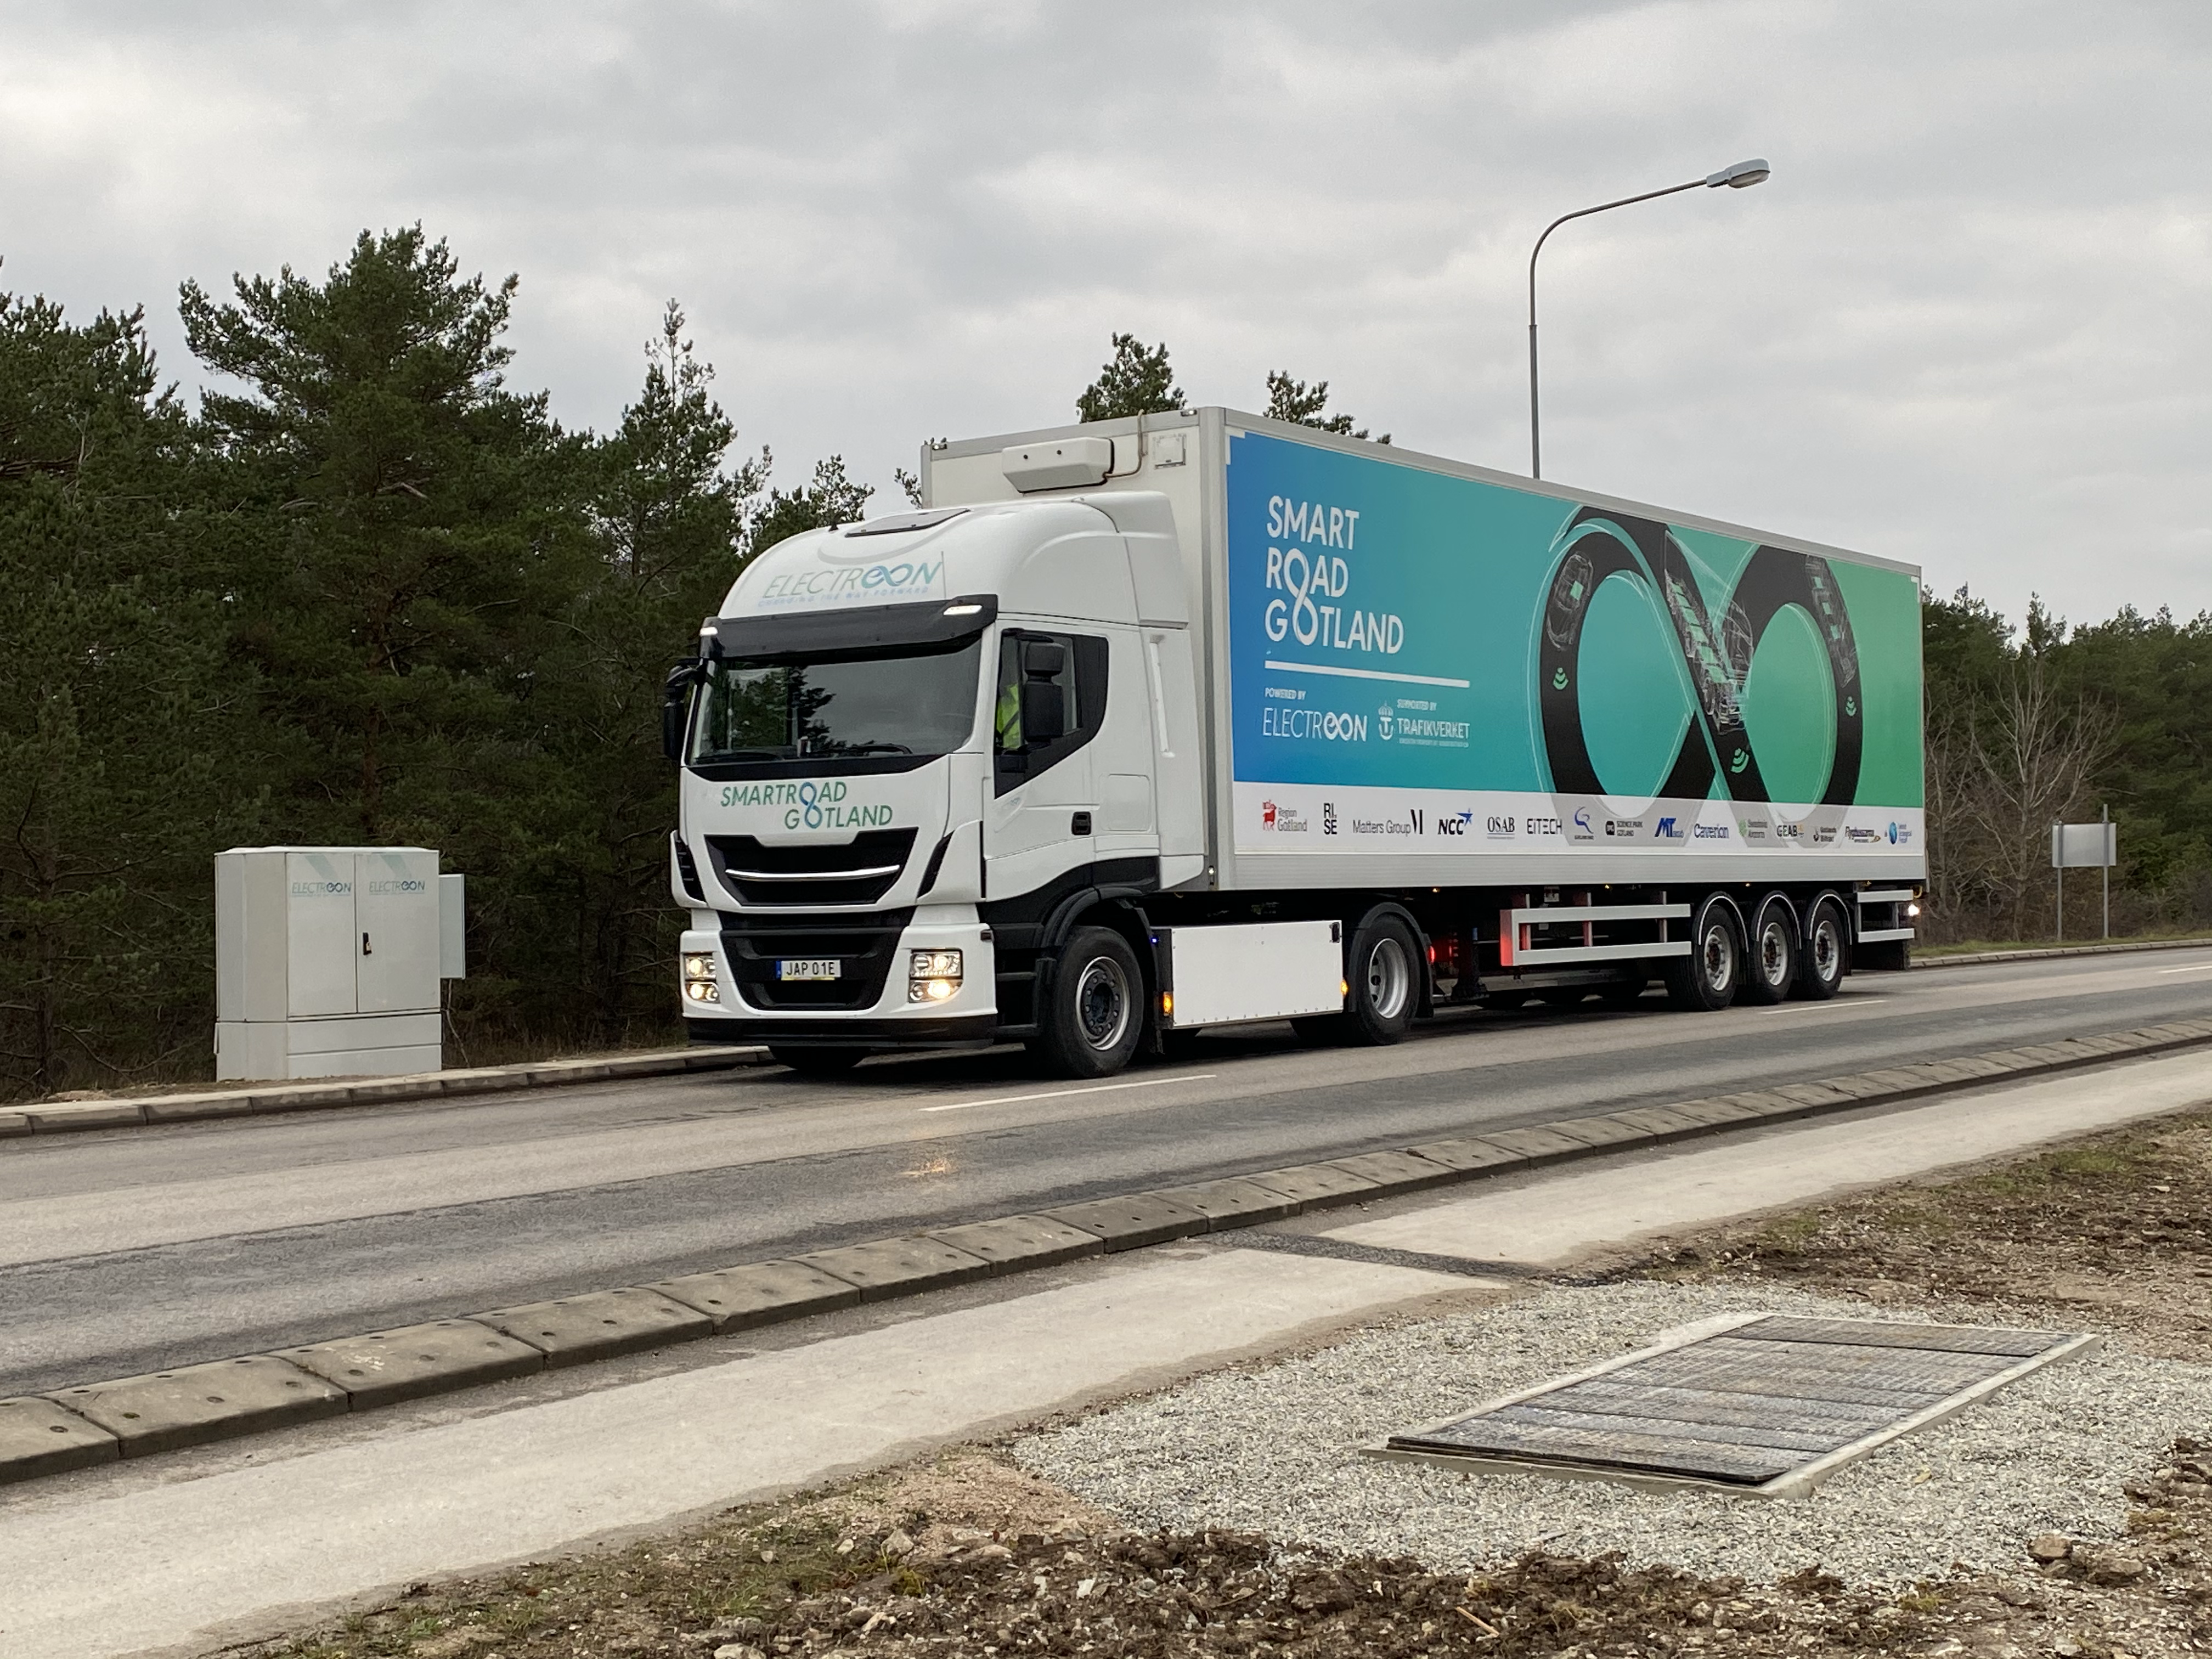 SmartRoad Gotland truck